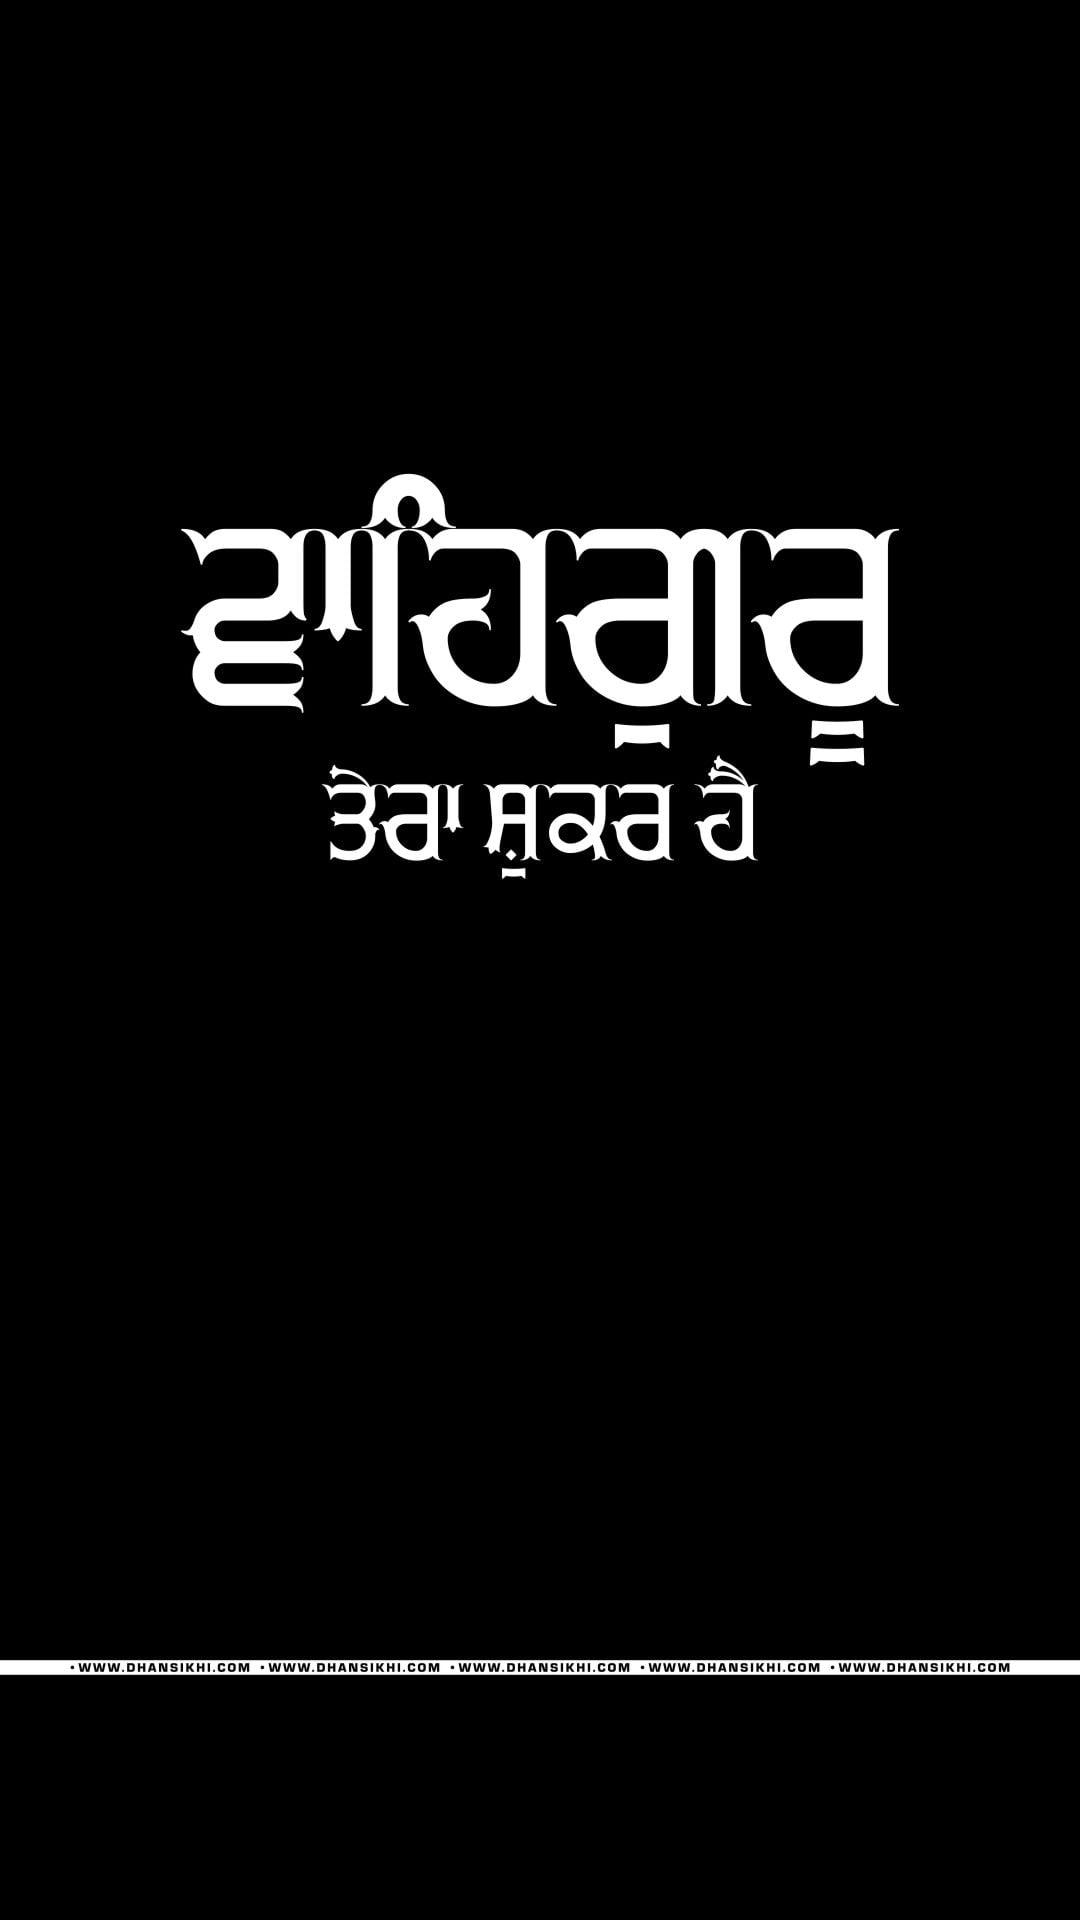 Mobile Wallpaper - Waheguru Tera Shukar Hai Black